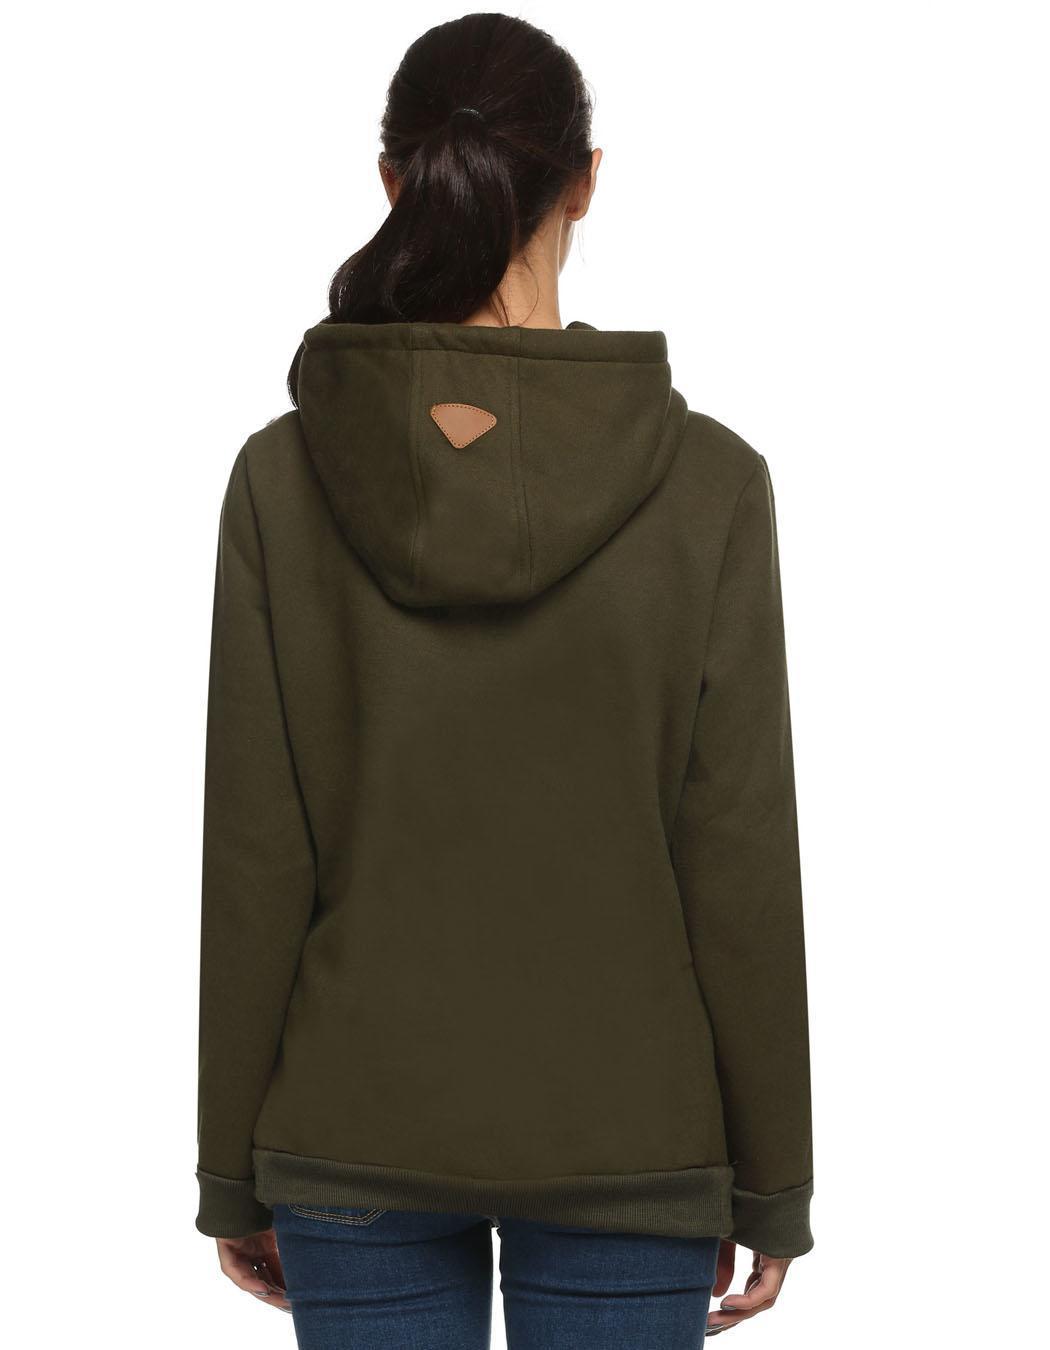 Women Long Sleeve Casual Pullover Hooded Sweatershirt Hoodies 4